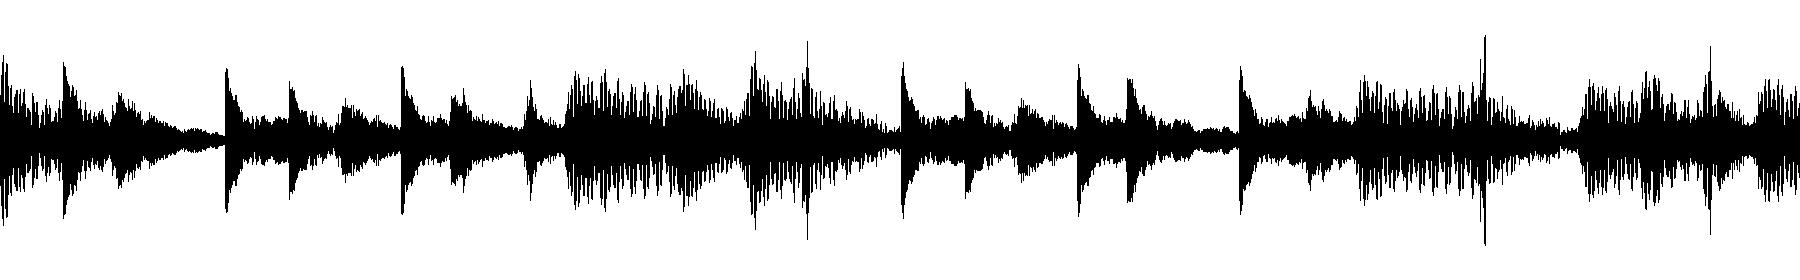 g abs05 066